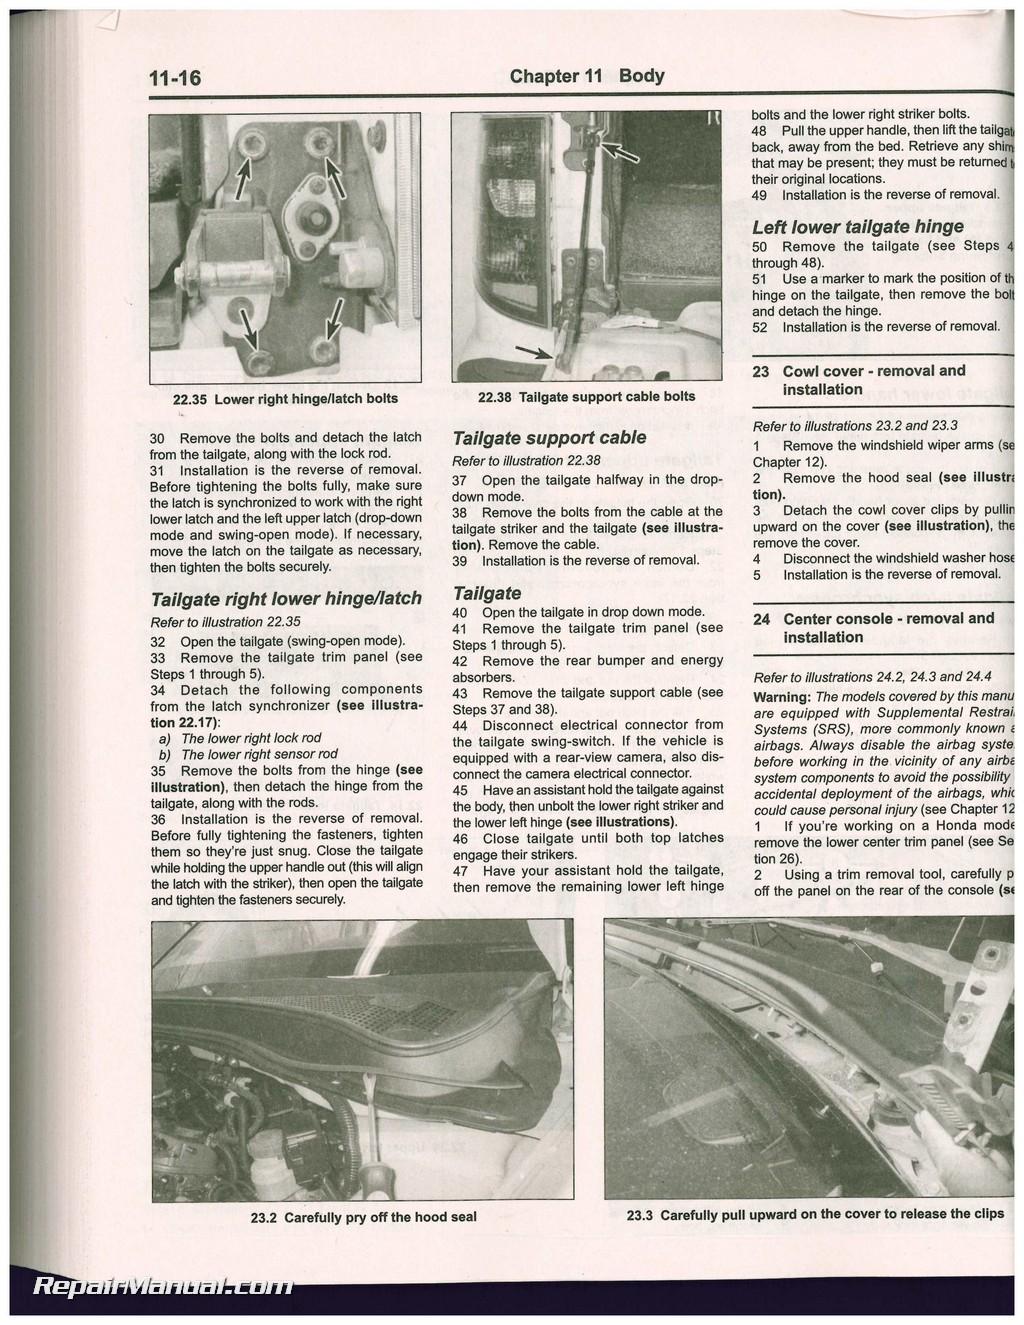 honda pilot 2003 2008 honda ridgeline 2006 2014 acura mdx 2001 2007 rh repairmanual com Stick Shift 7 Speed Manual Transmission